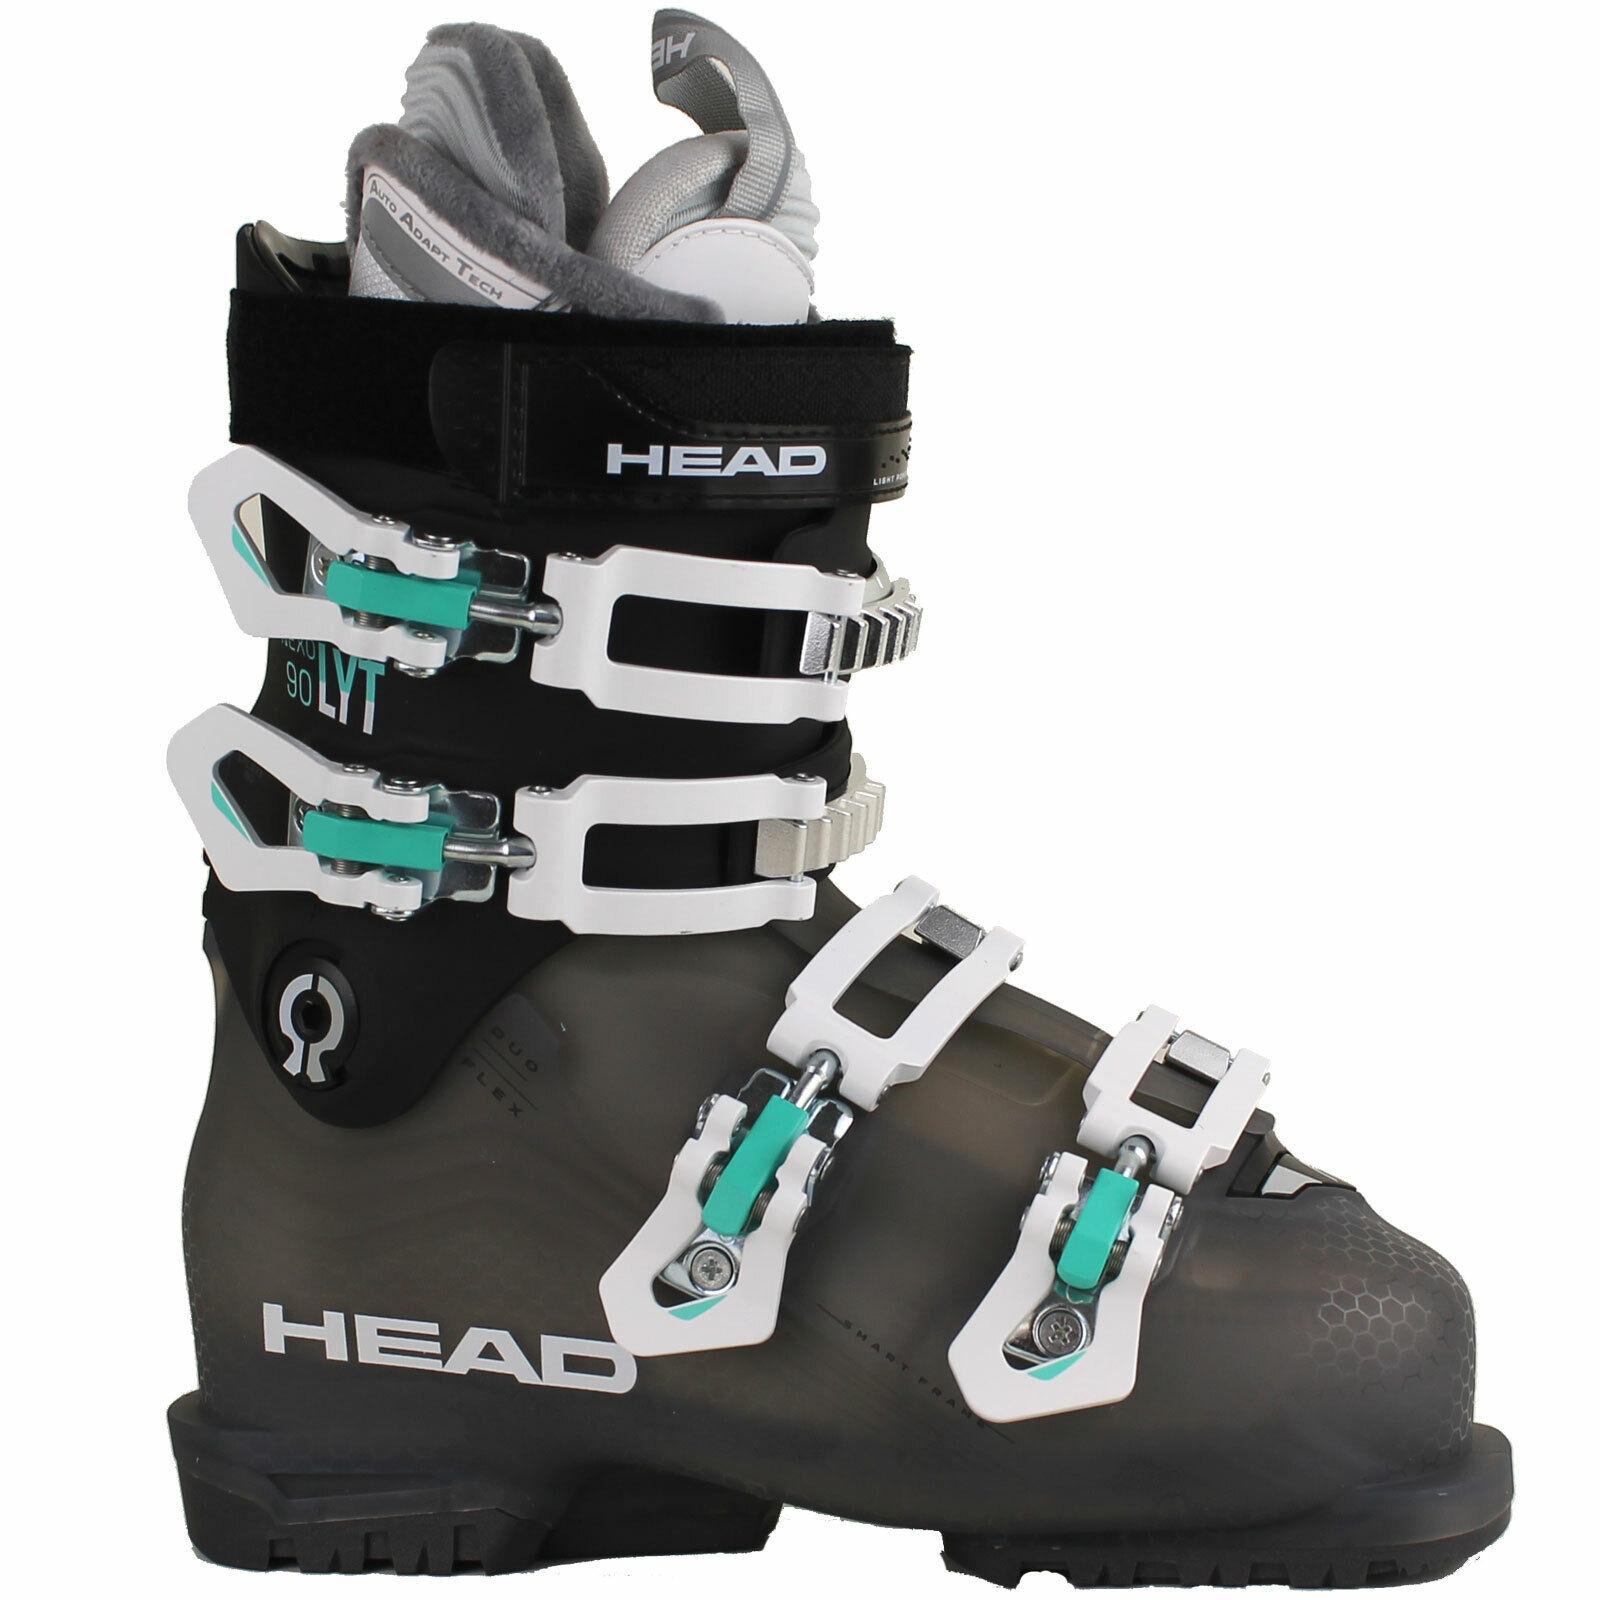 Head Nexo Lyt 90 W R Damen-Skischuhe Alpin-Skistiefel Ski stiefel SkiStiefel Stiefel